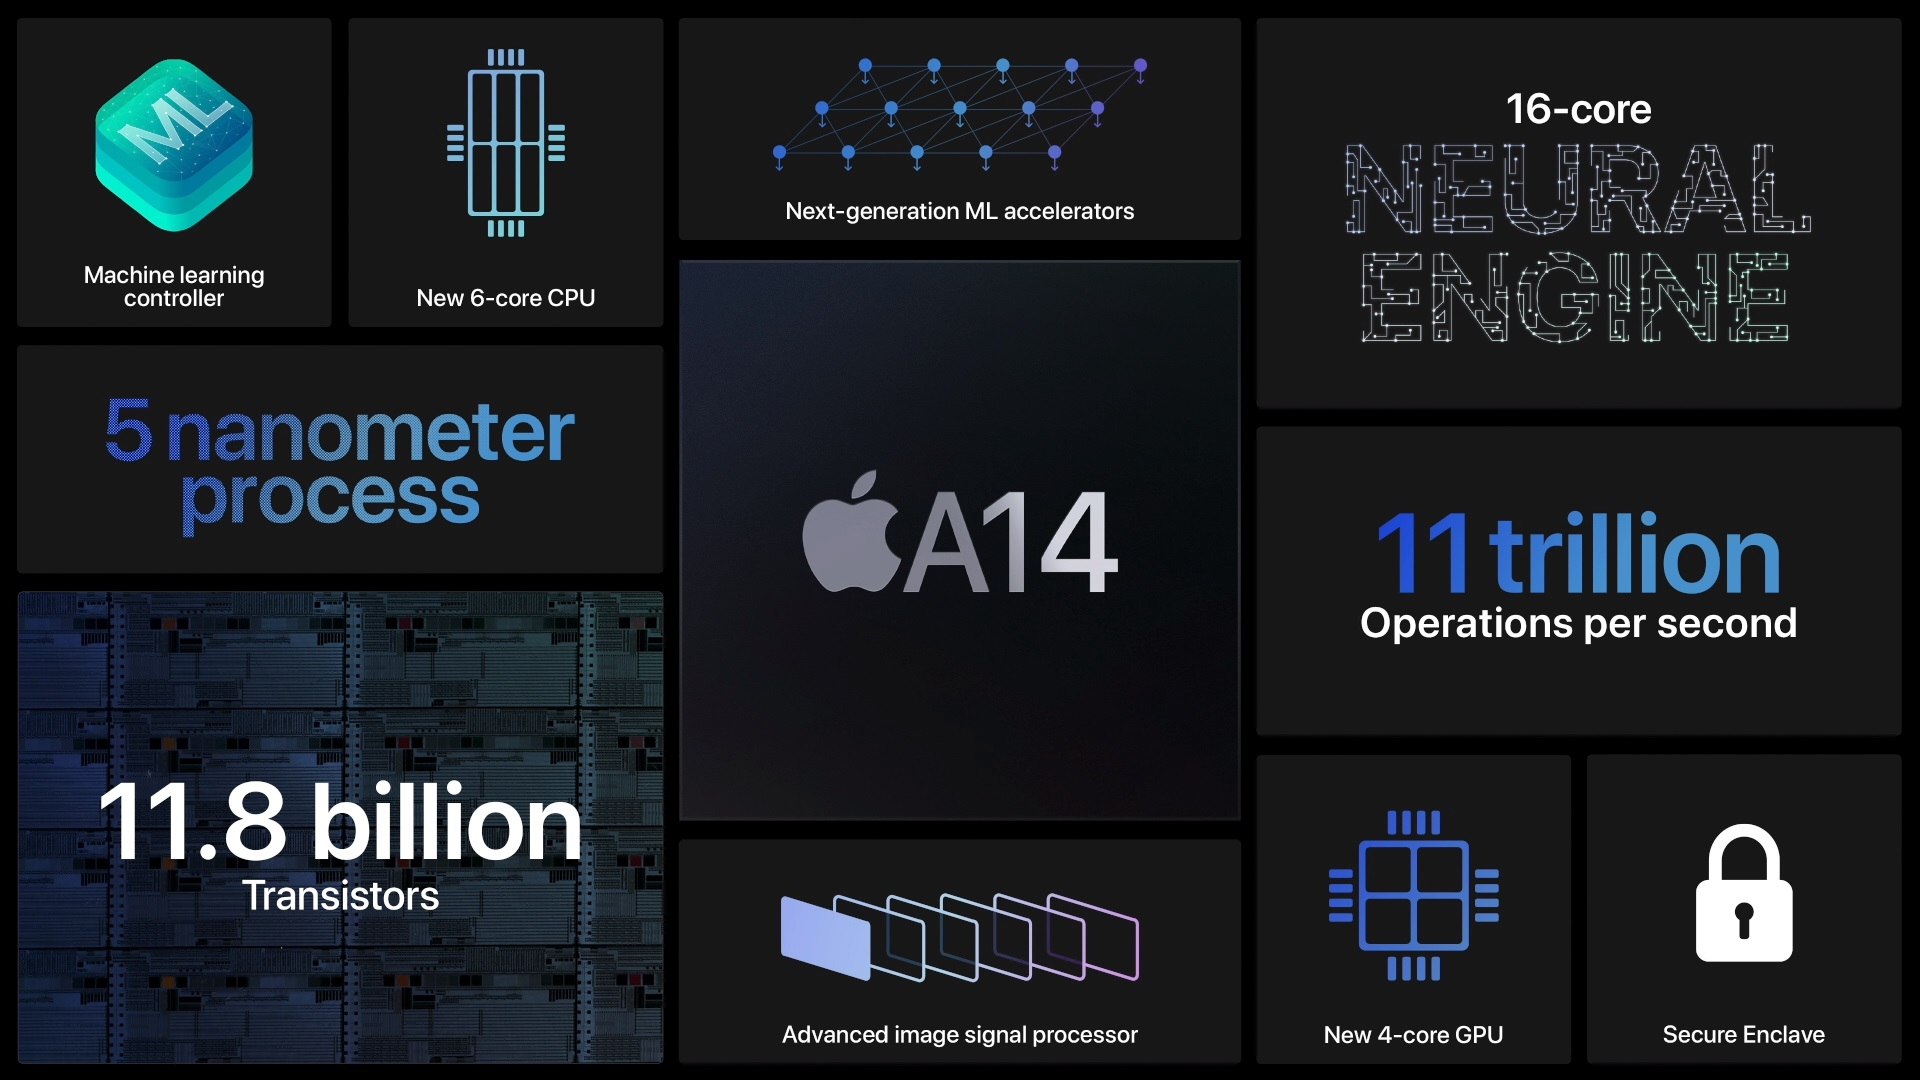 Apple A14 Bionic chip